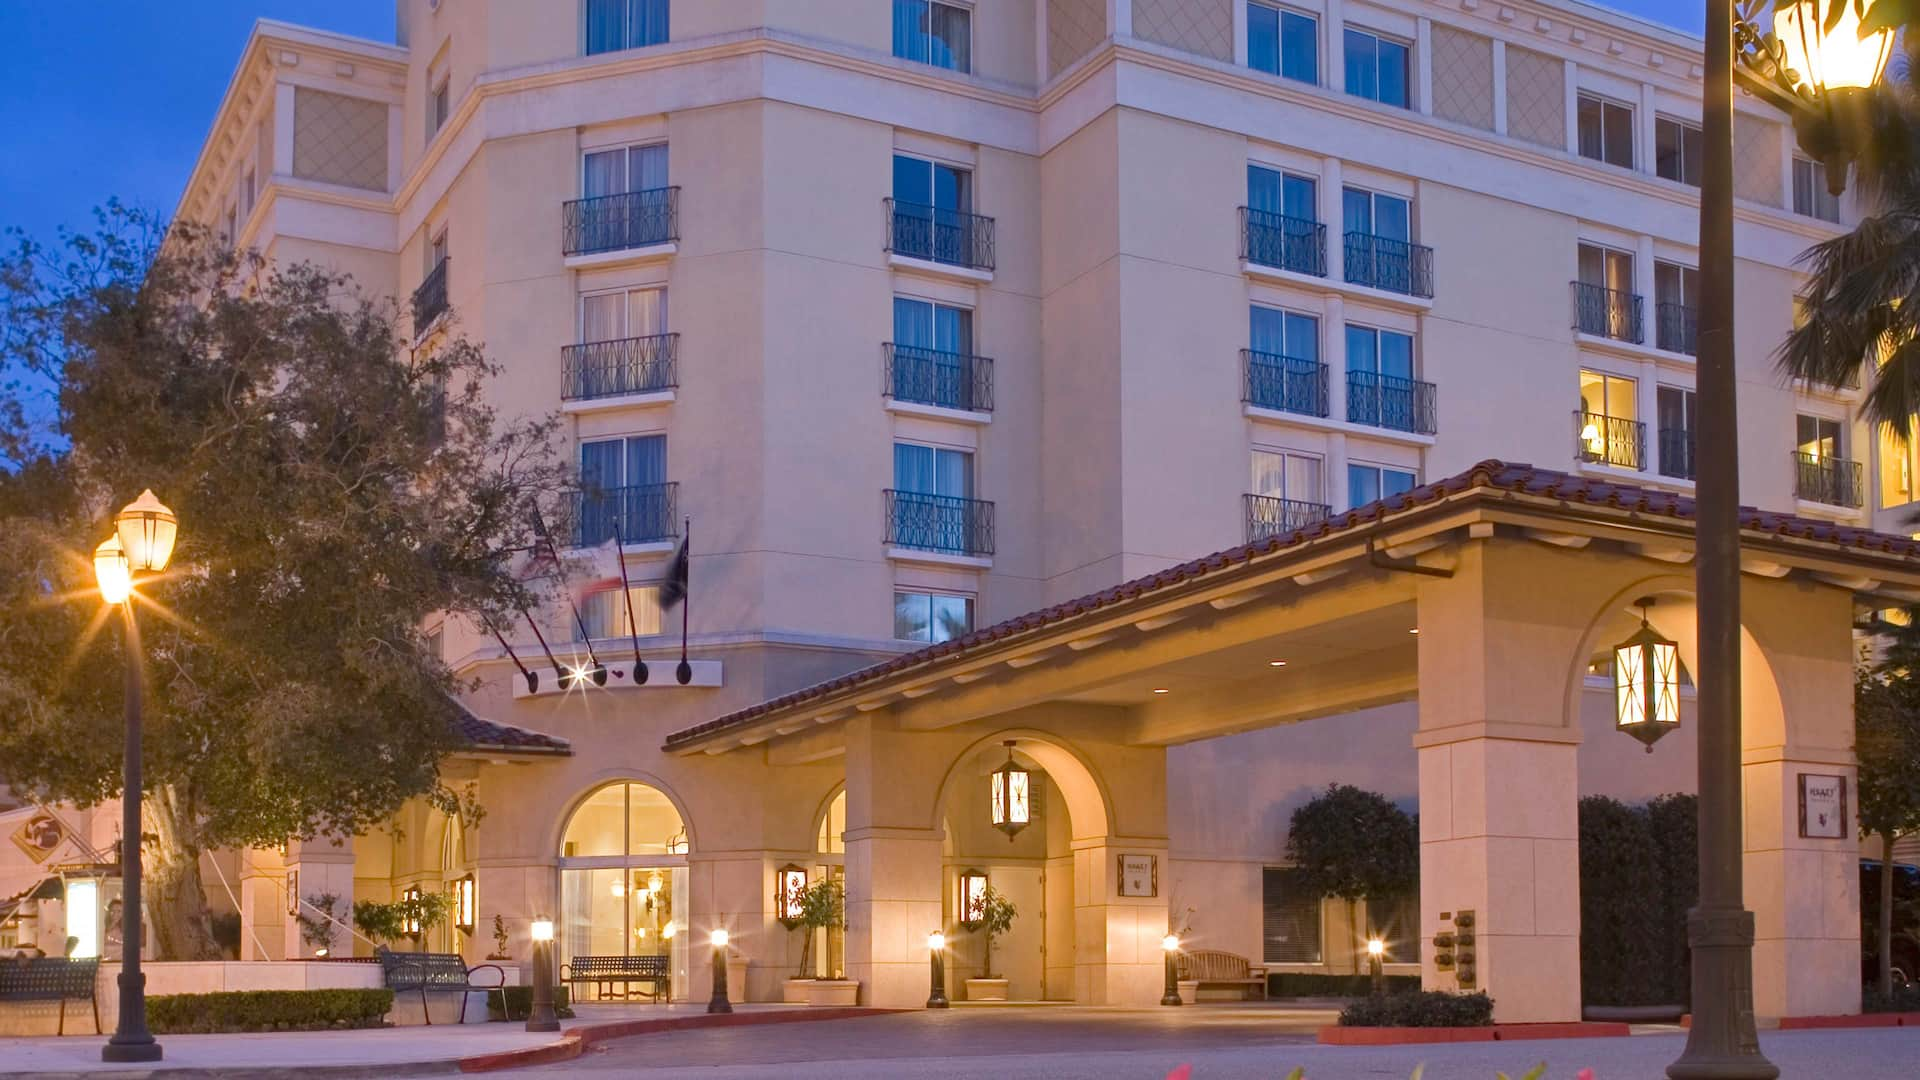 Valencia Hotel Exterior